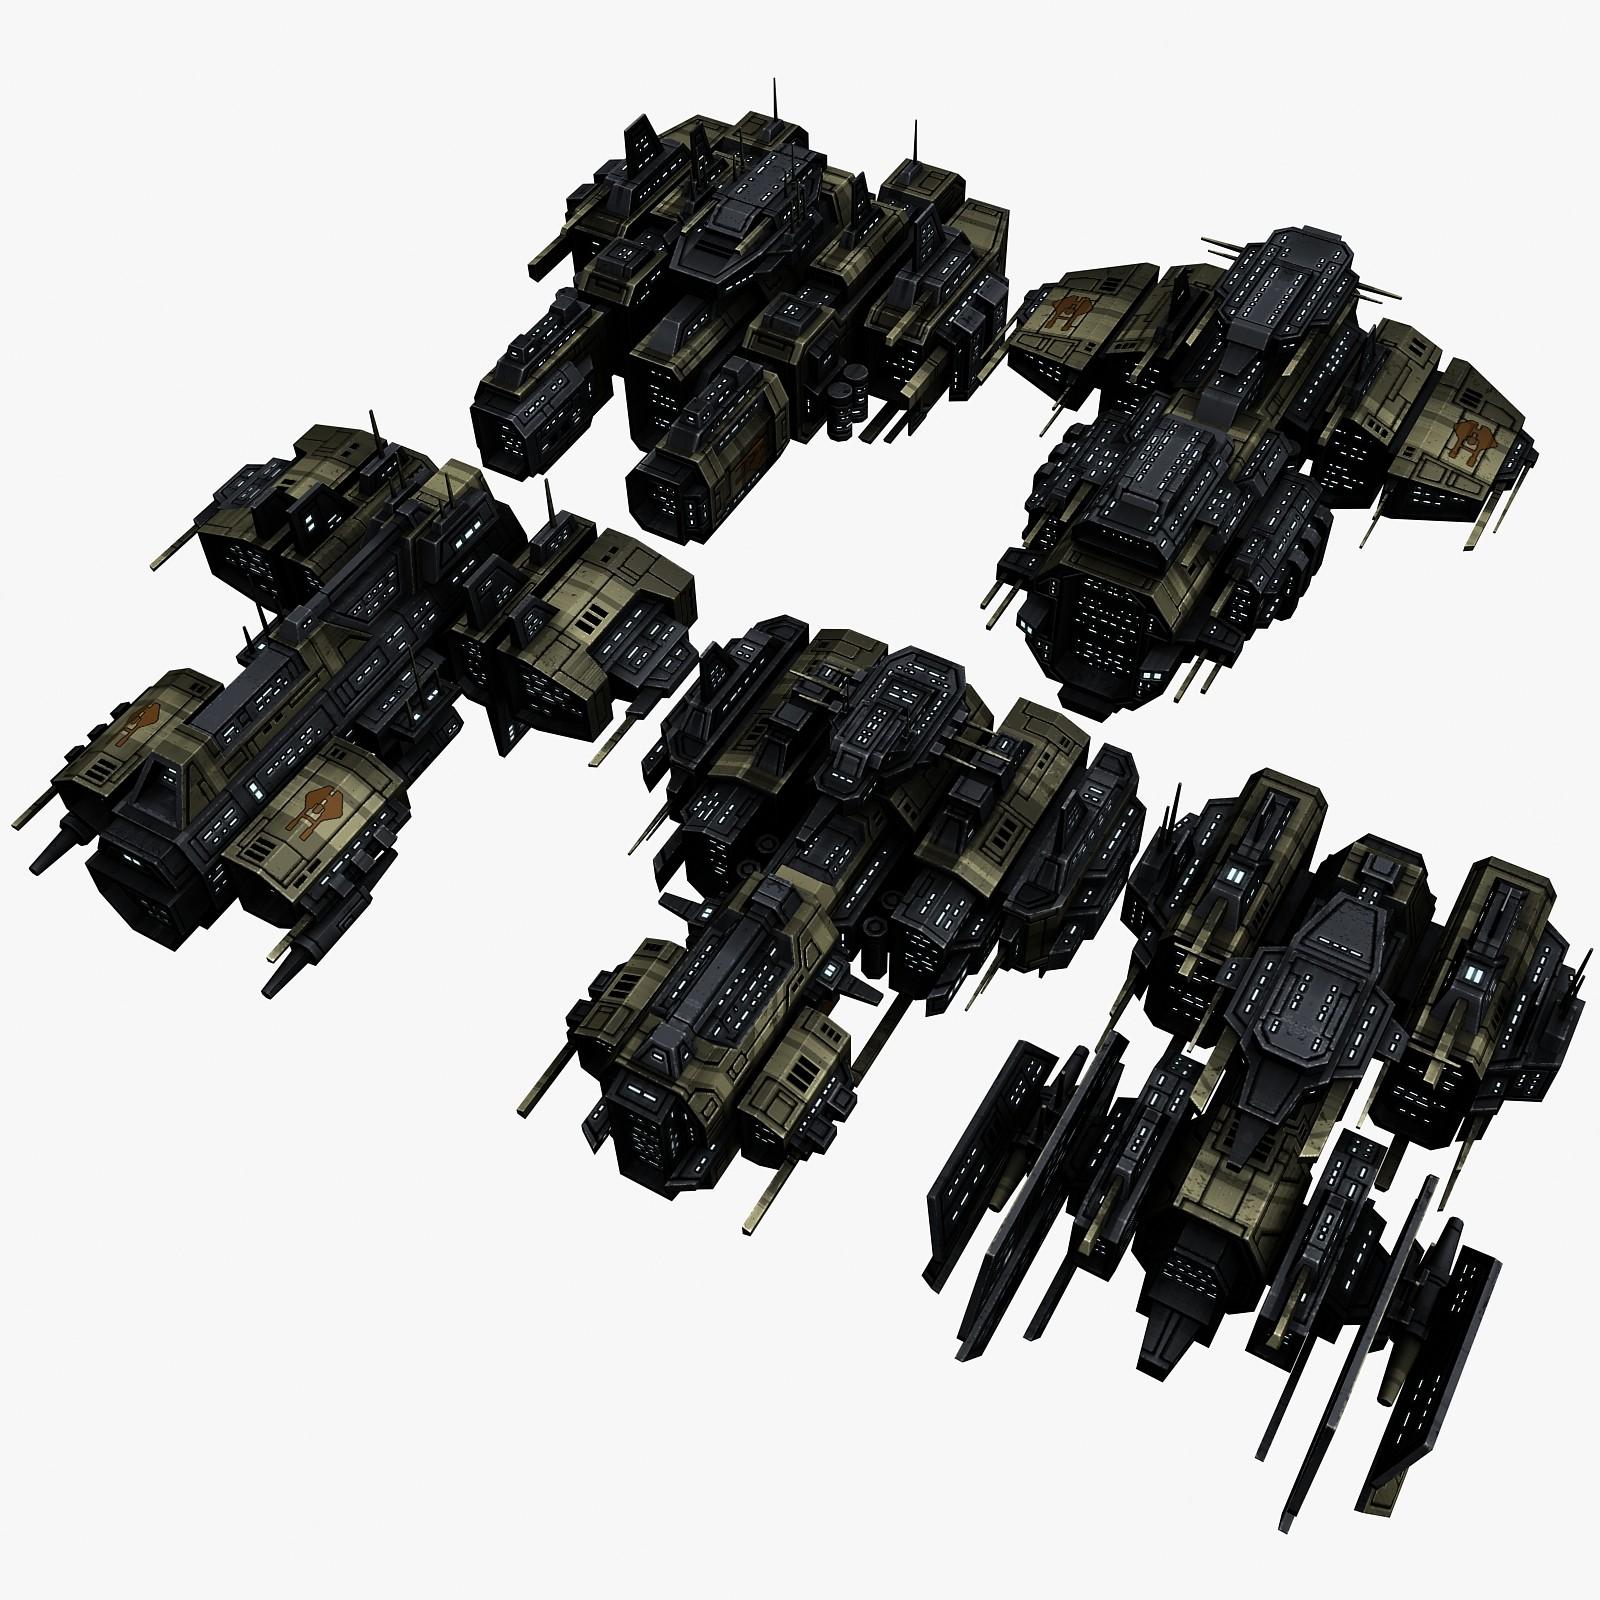 5_battleship_destroyers_upgraded_preview.jpg